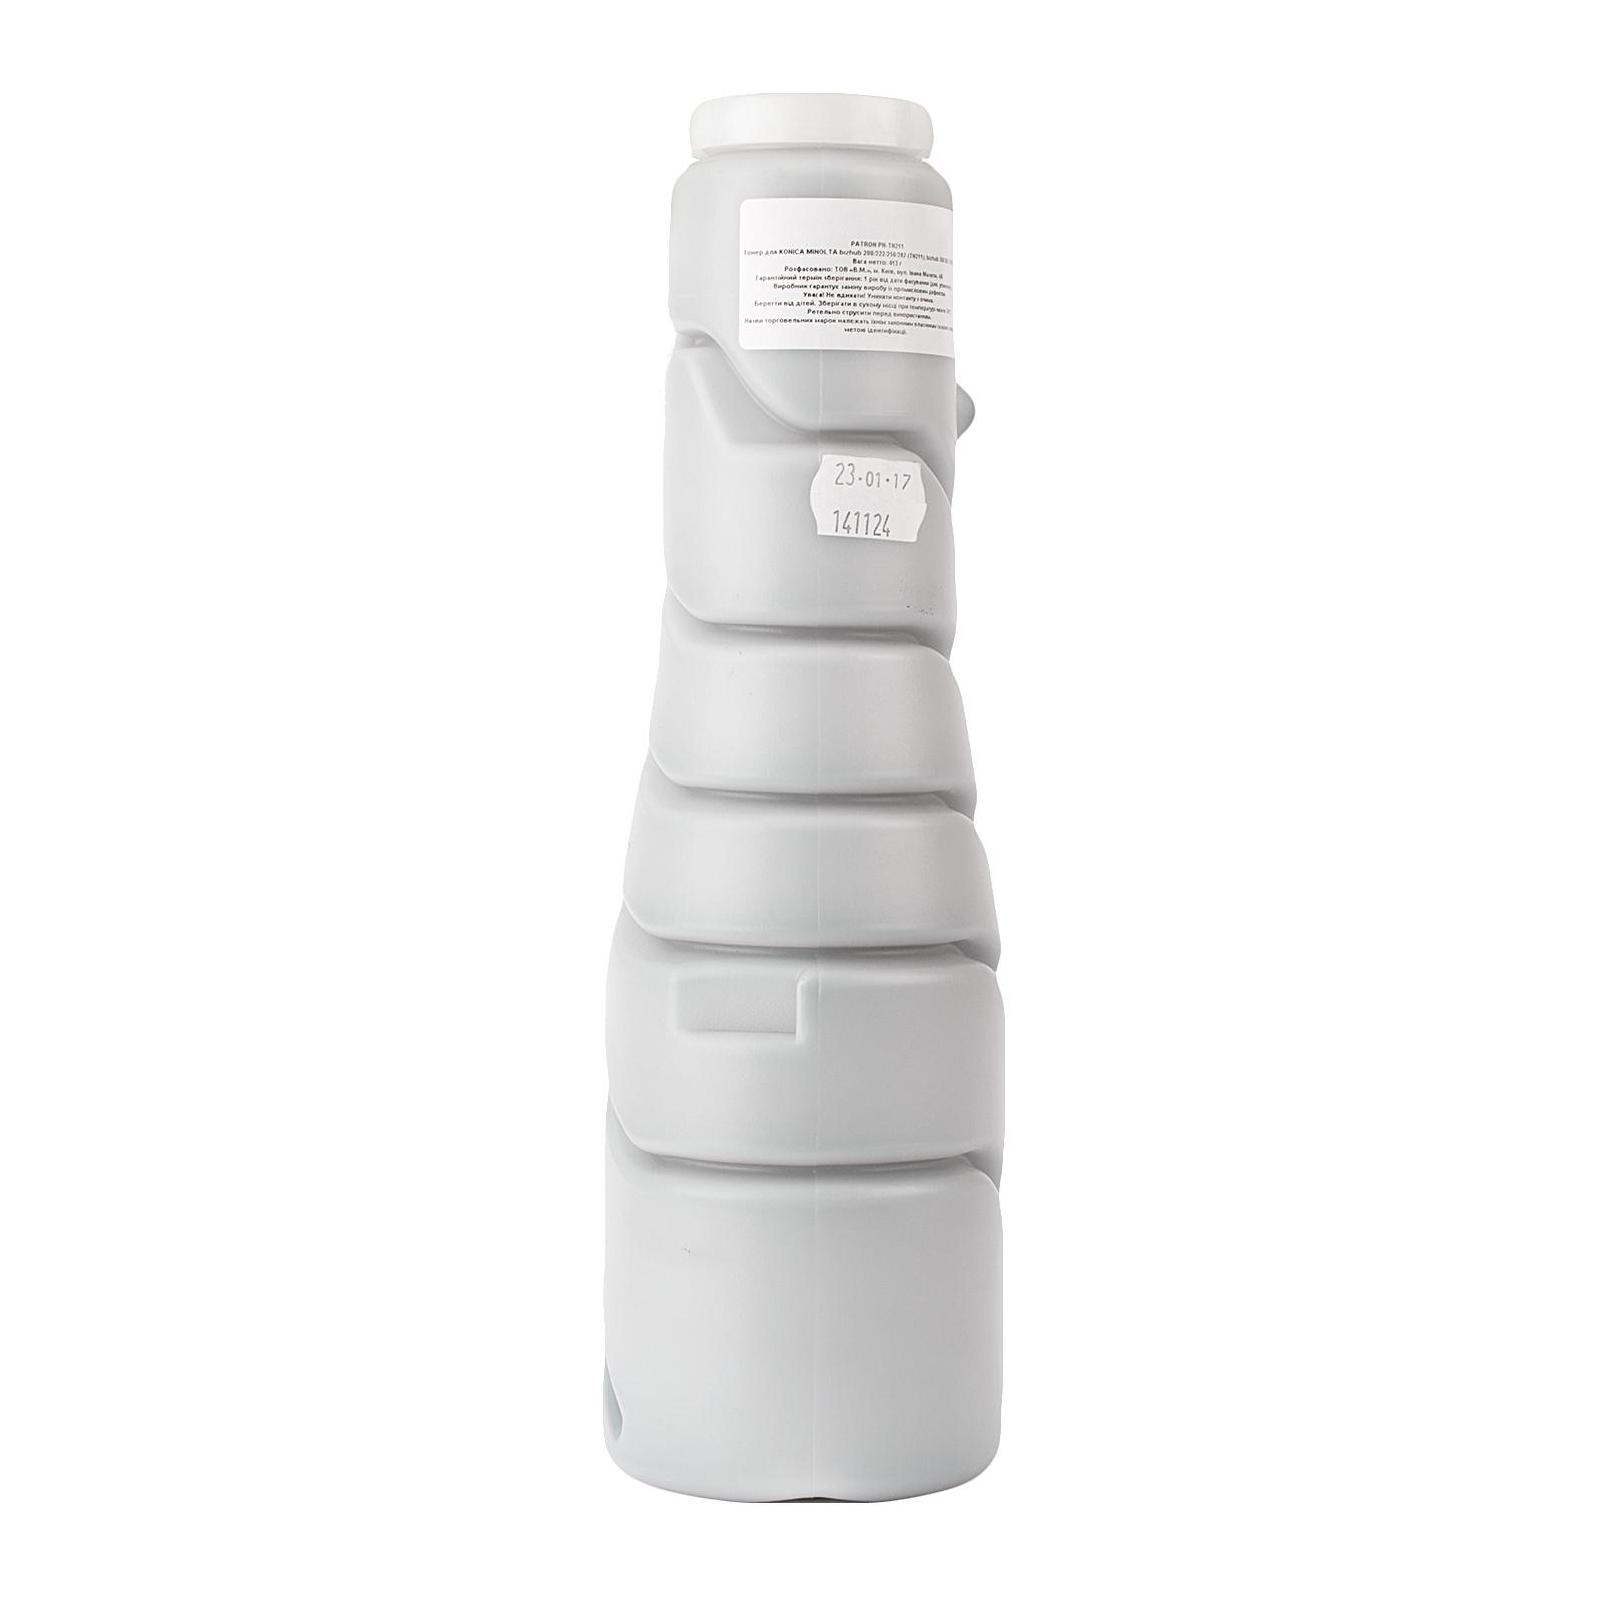 Тонер Patron Konica Minolta TN-211/TN311, 413г, bizhub 200/350 (PN-TN211)